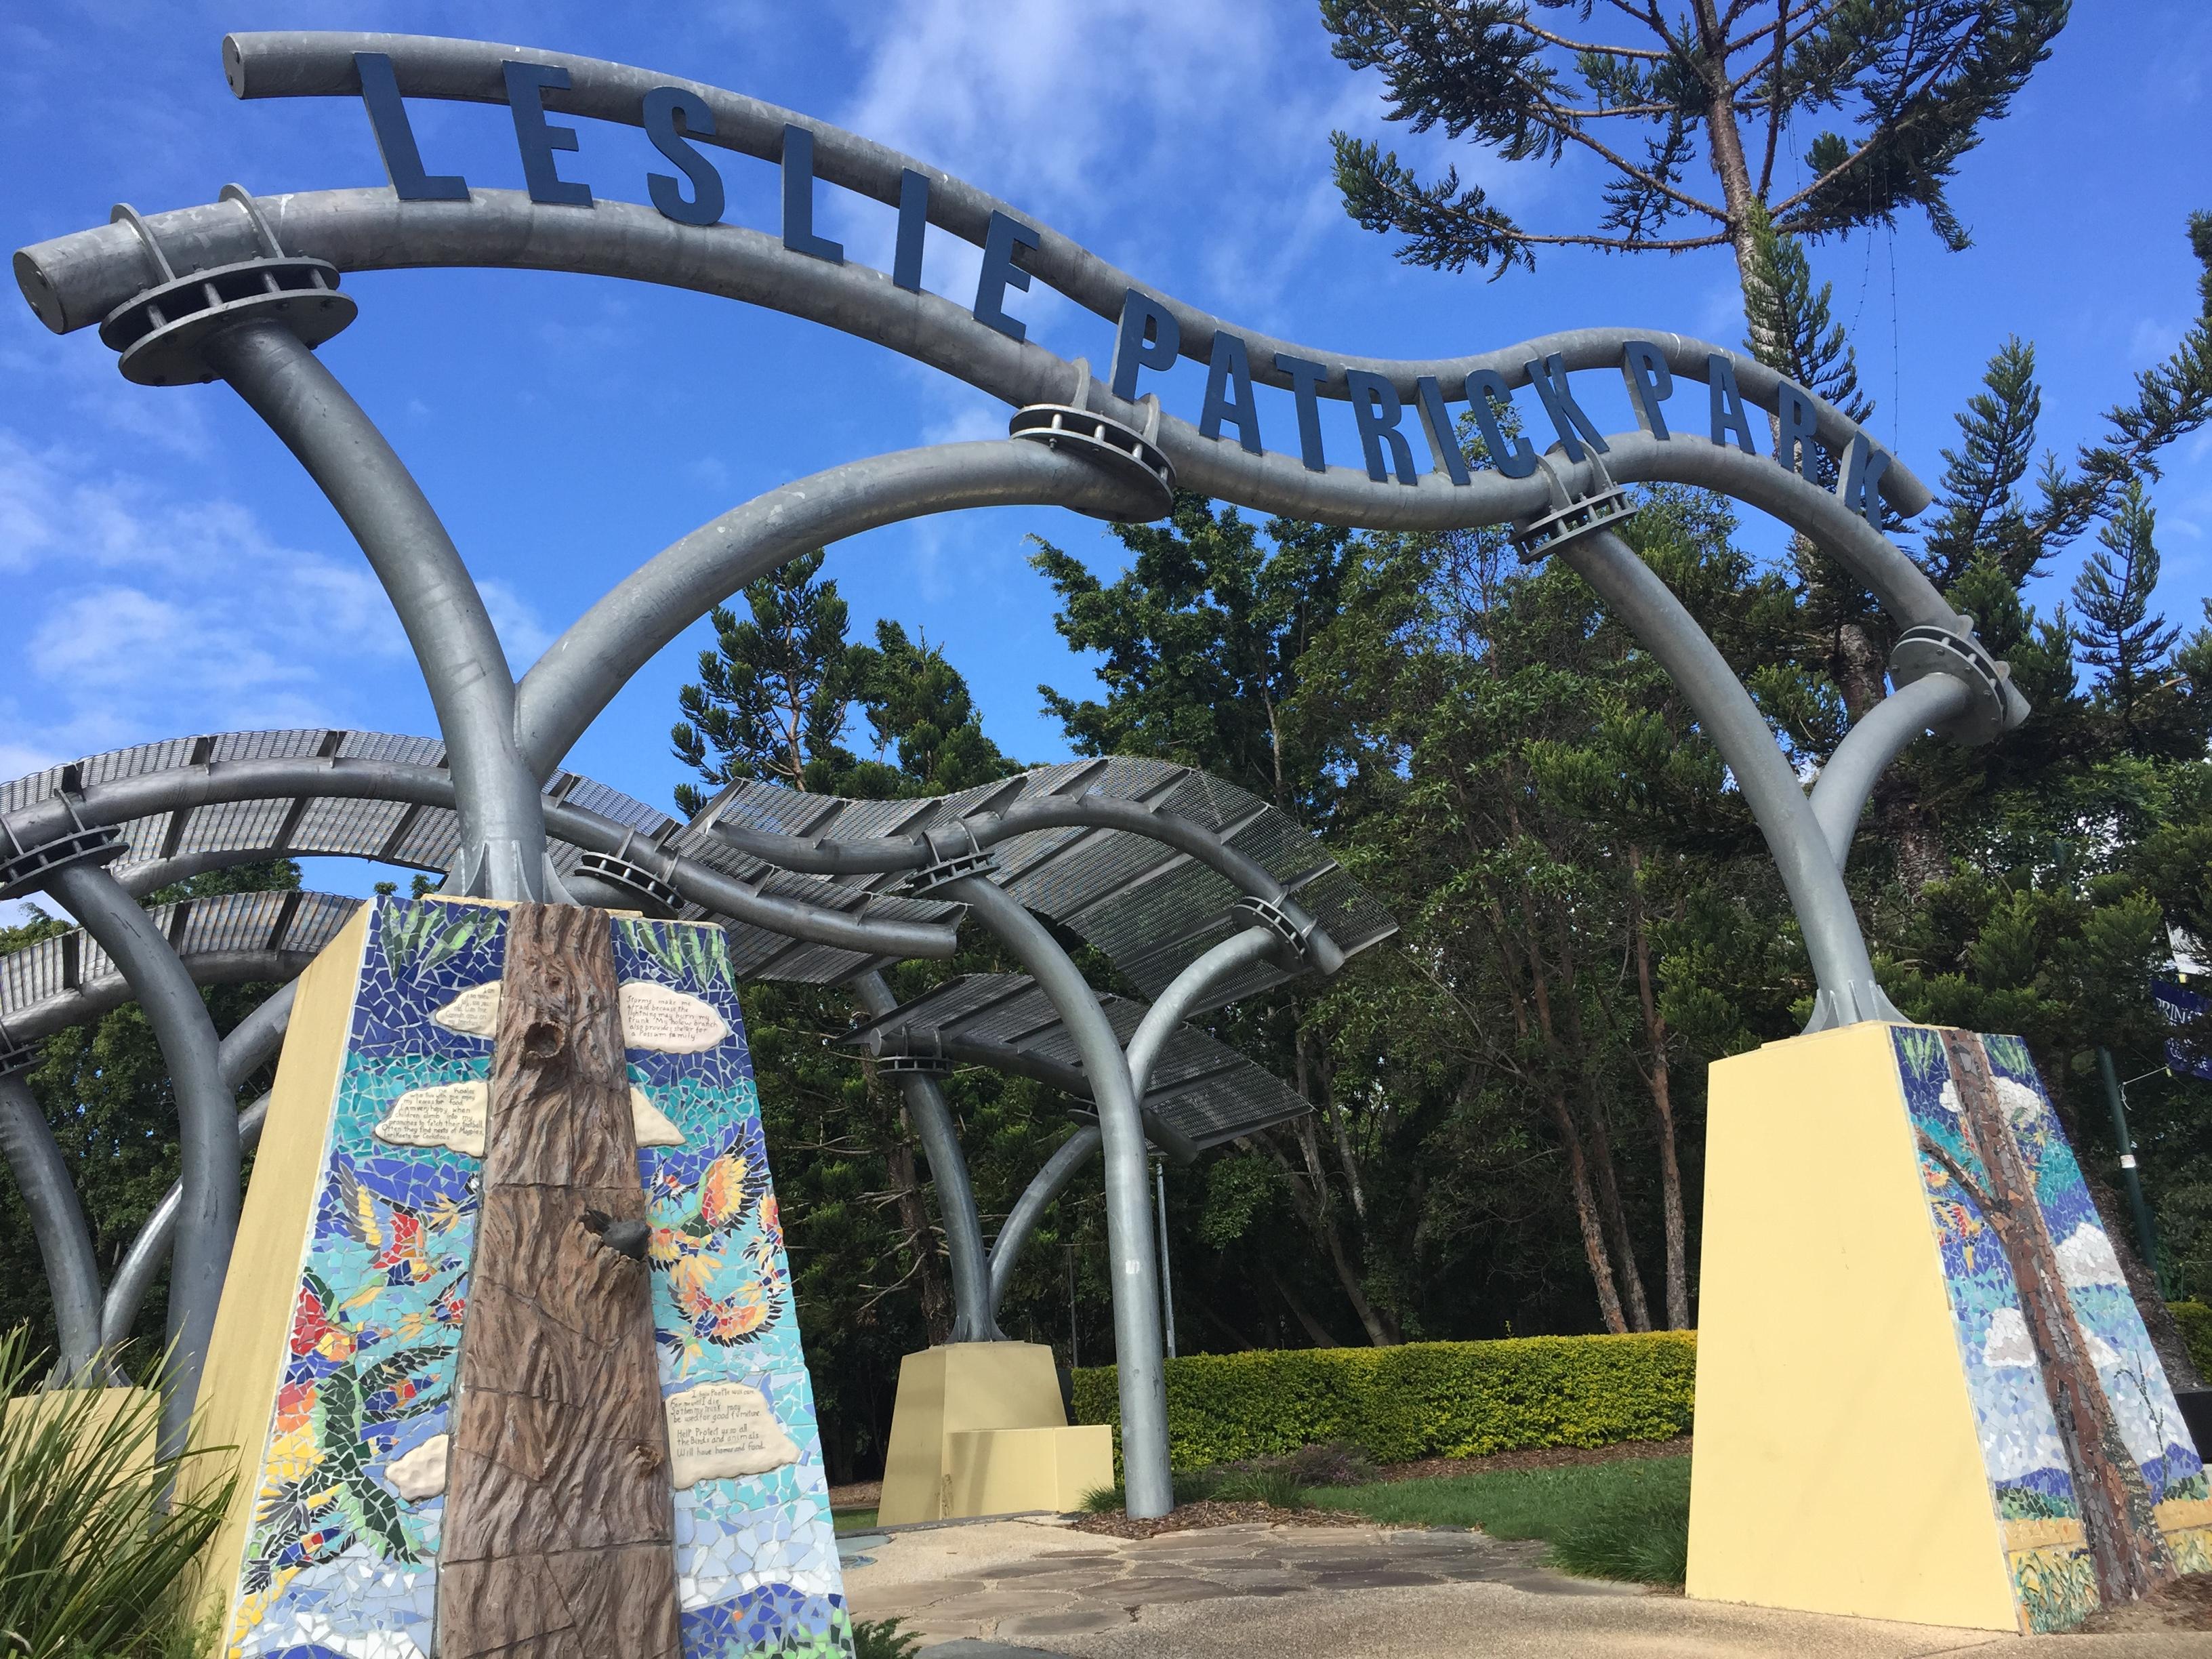 Leslie Patrick Park, Arana Hills, Brisbane, Queensland © GreenSocks